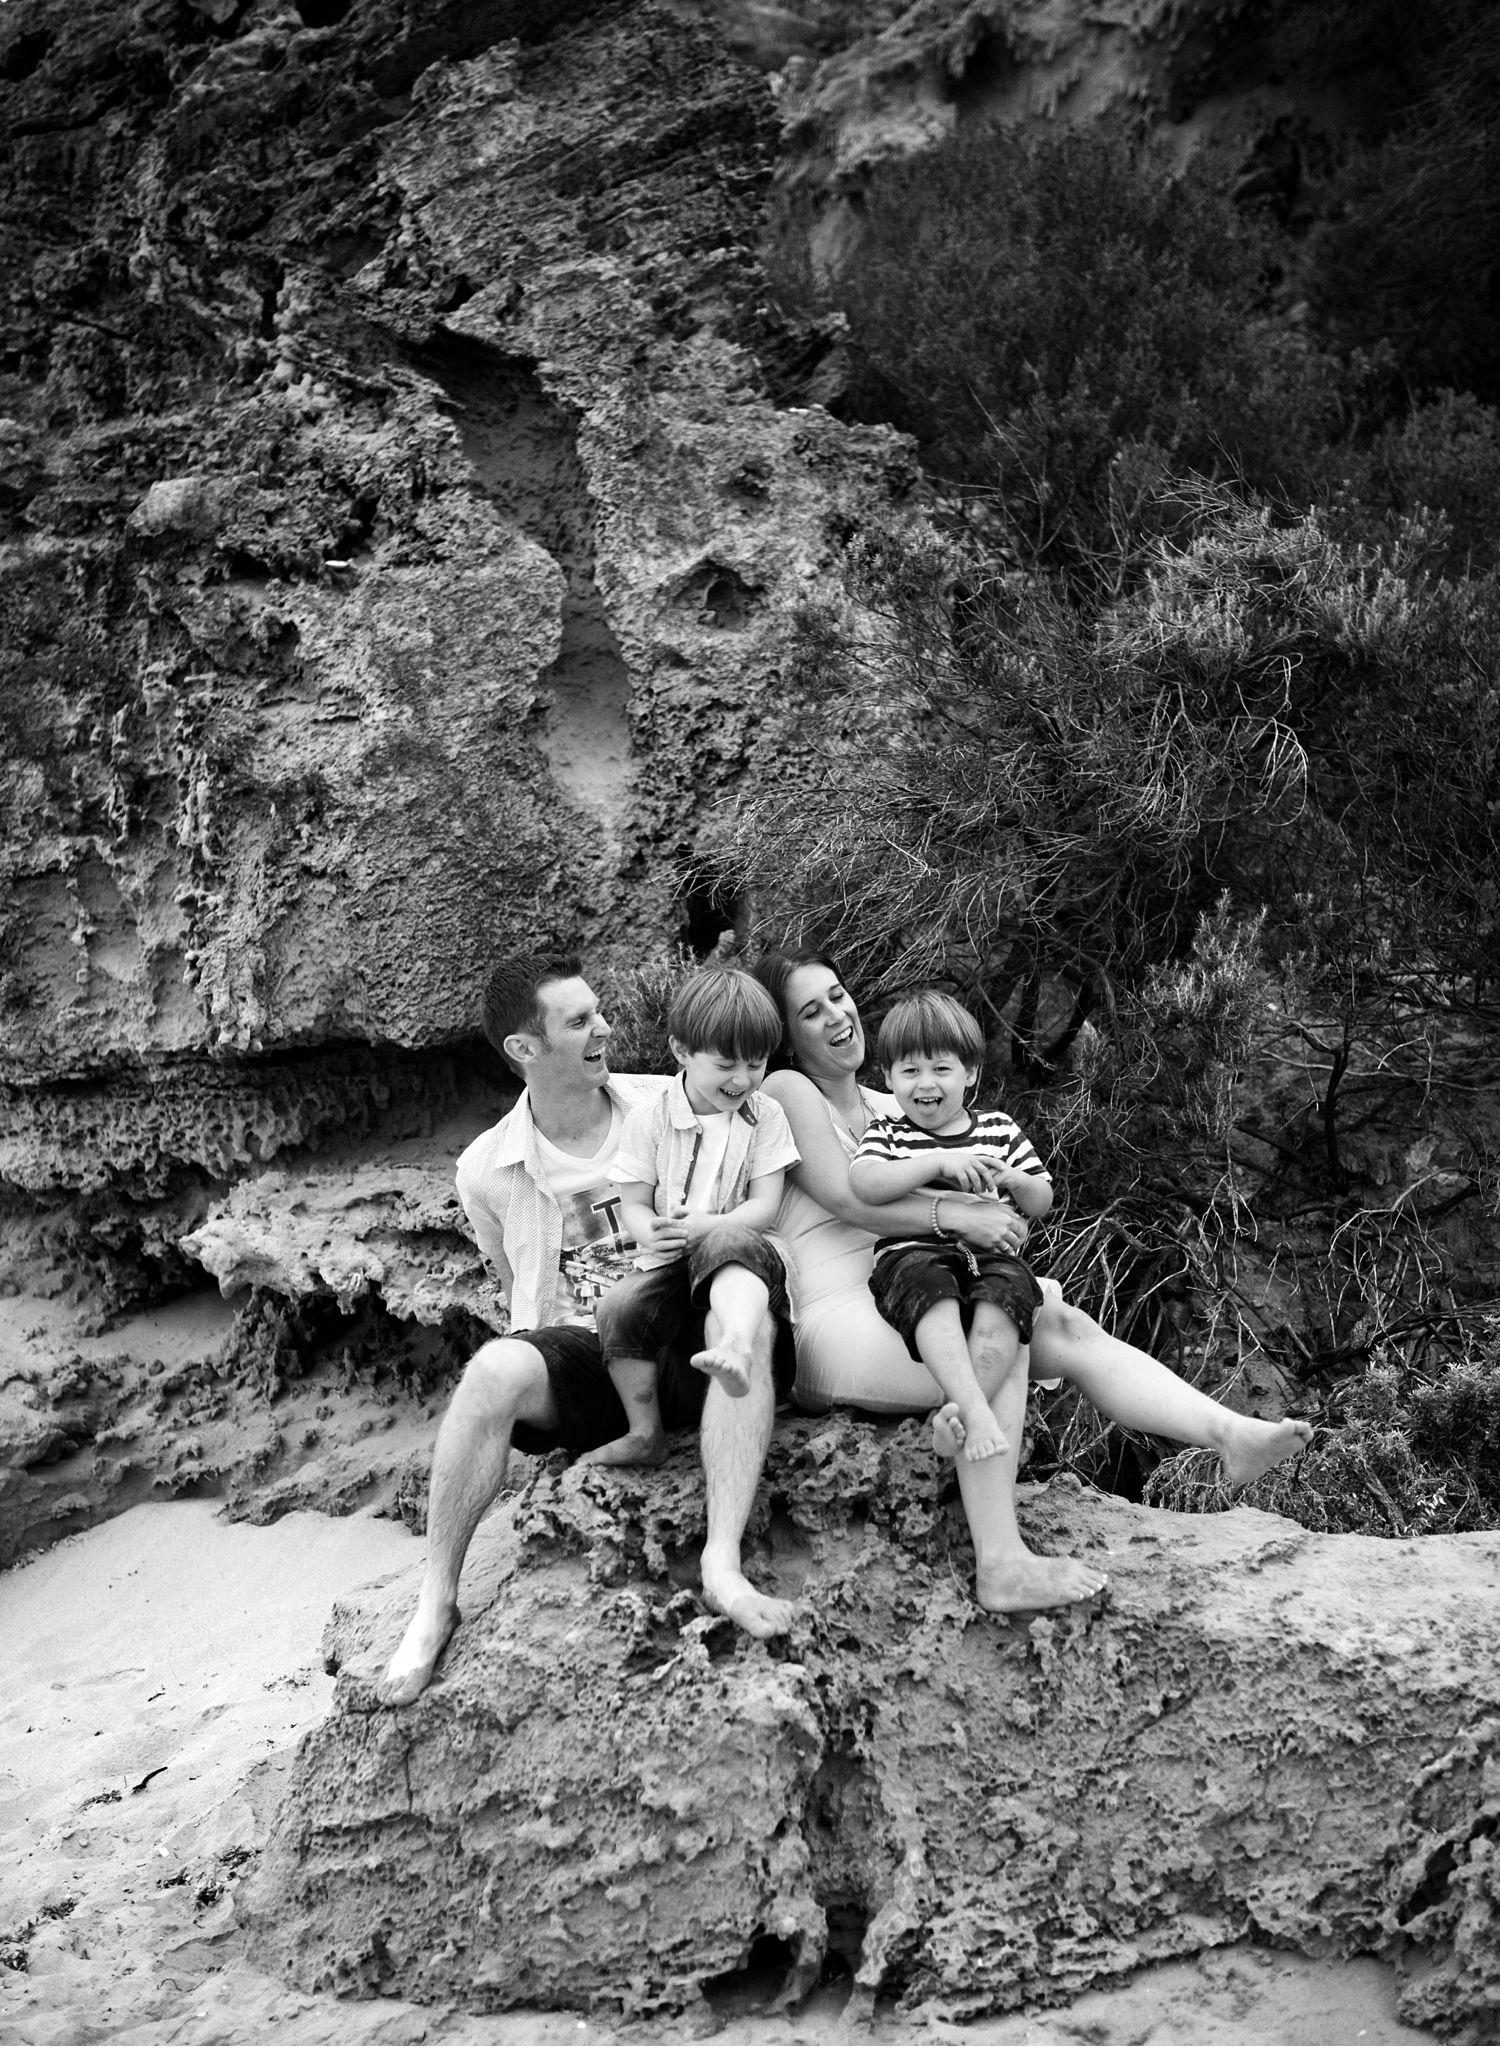 Natural-family-photography-city-casey.jpg